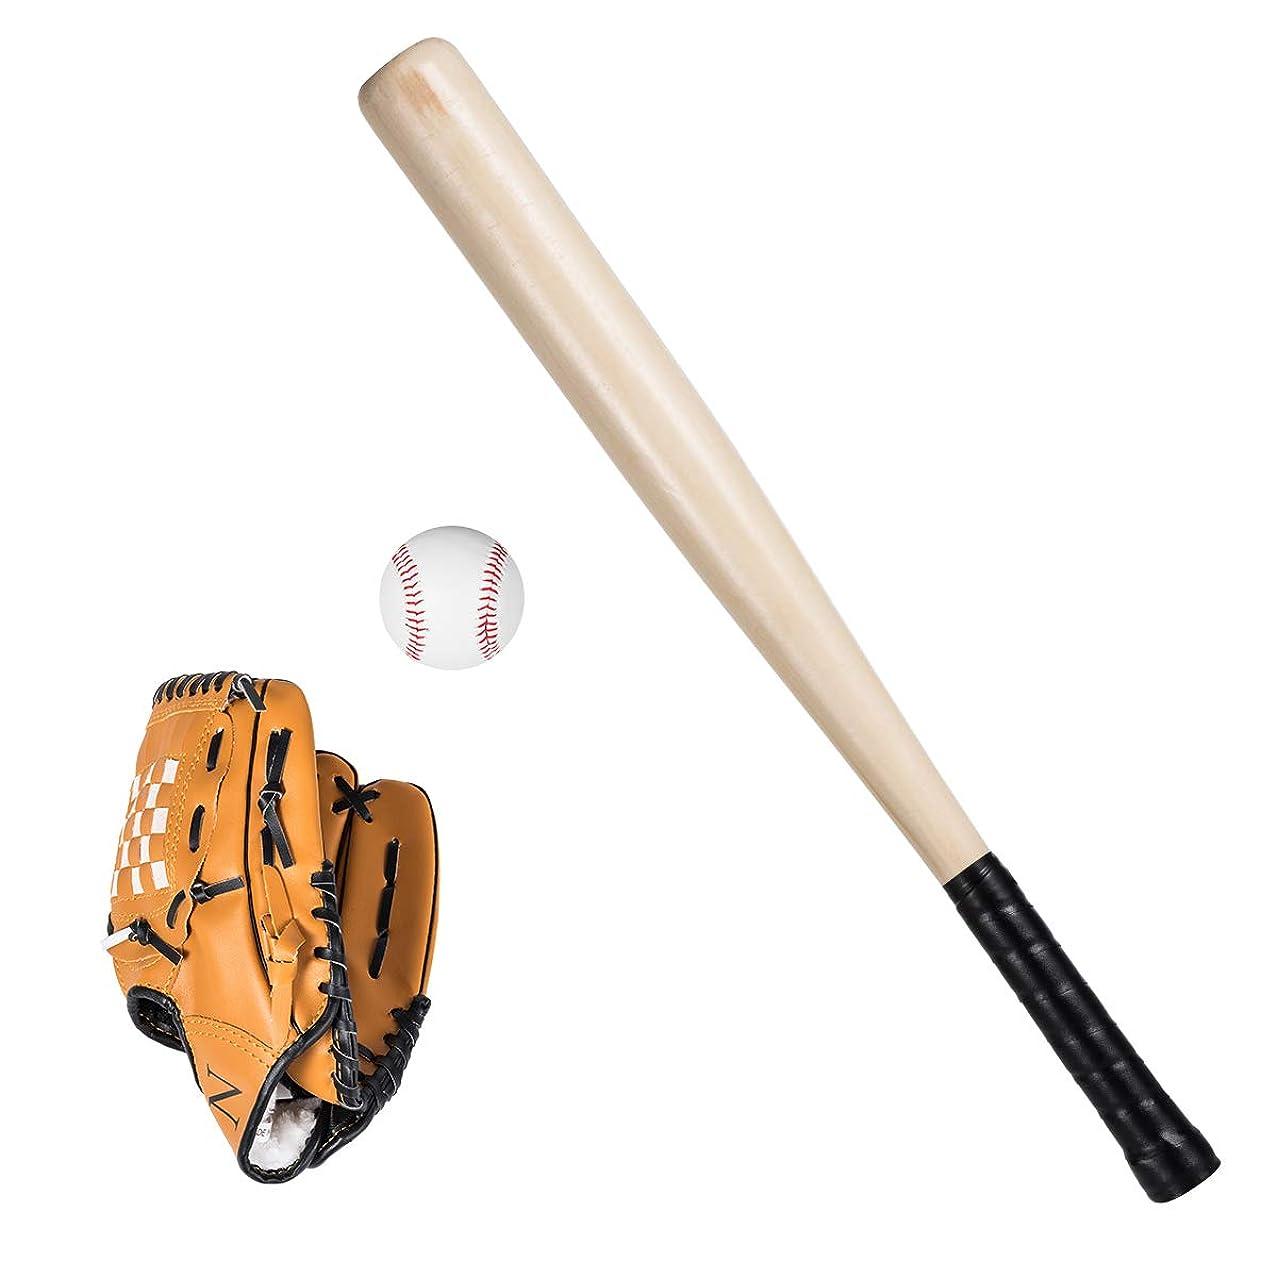 Wooden Baseball Bat Anti Skid Baseball Glove Durable Baseball Safety Sports Toy Set for Kids Children Toddler Boy Gifts